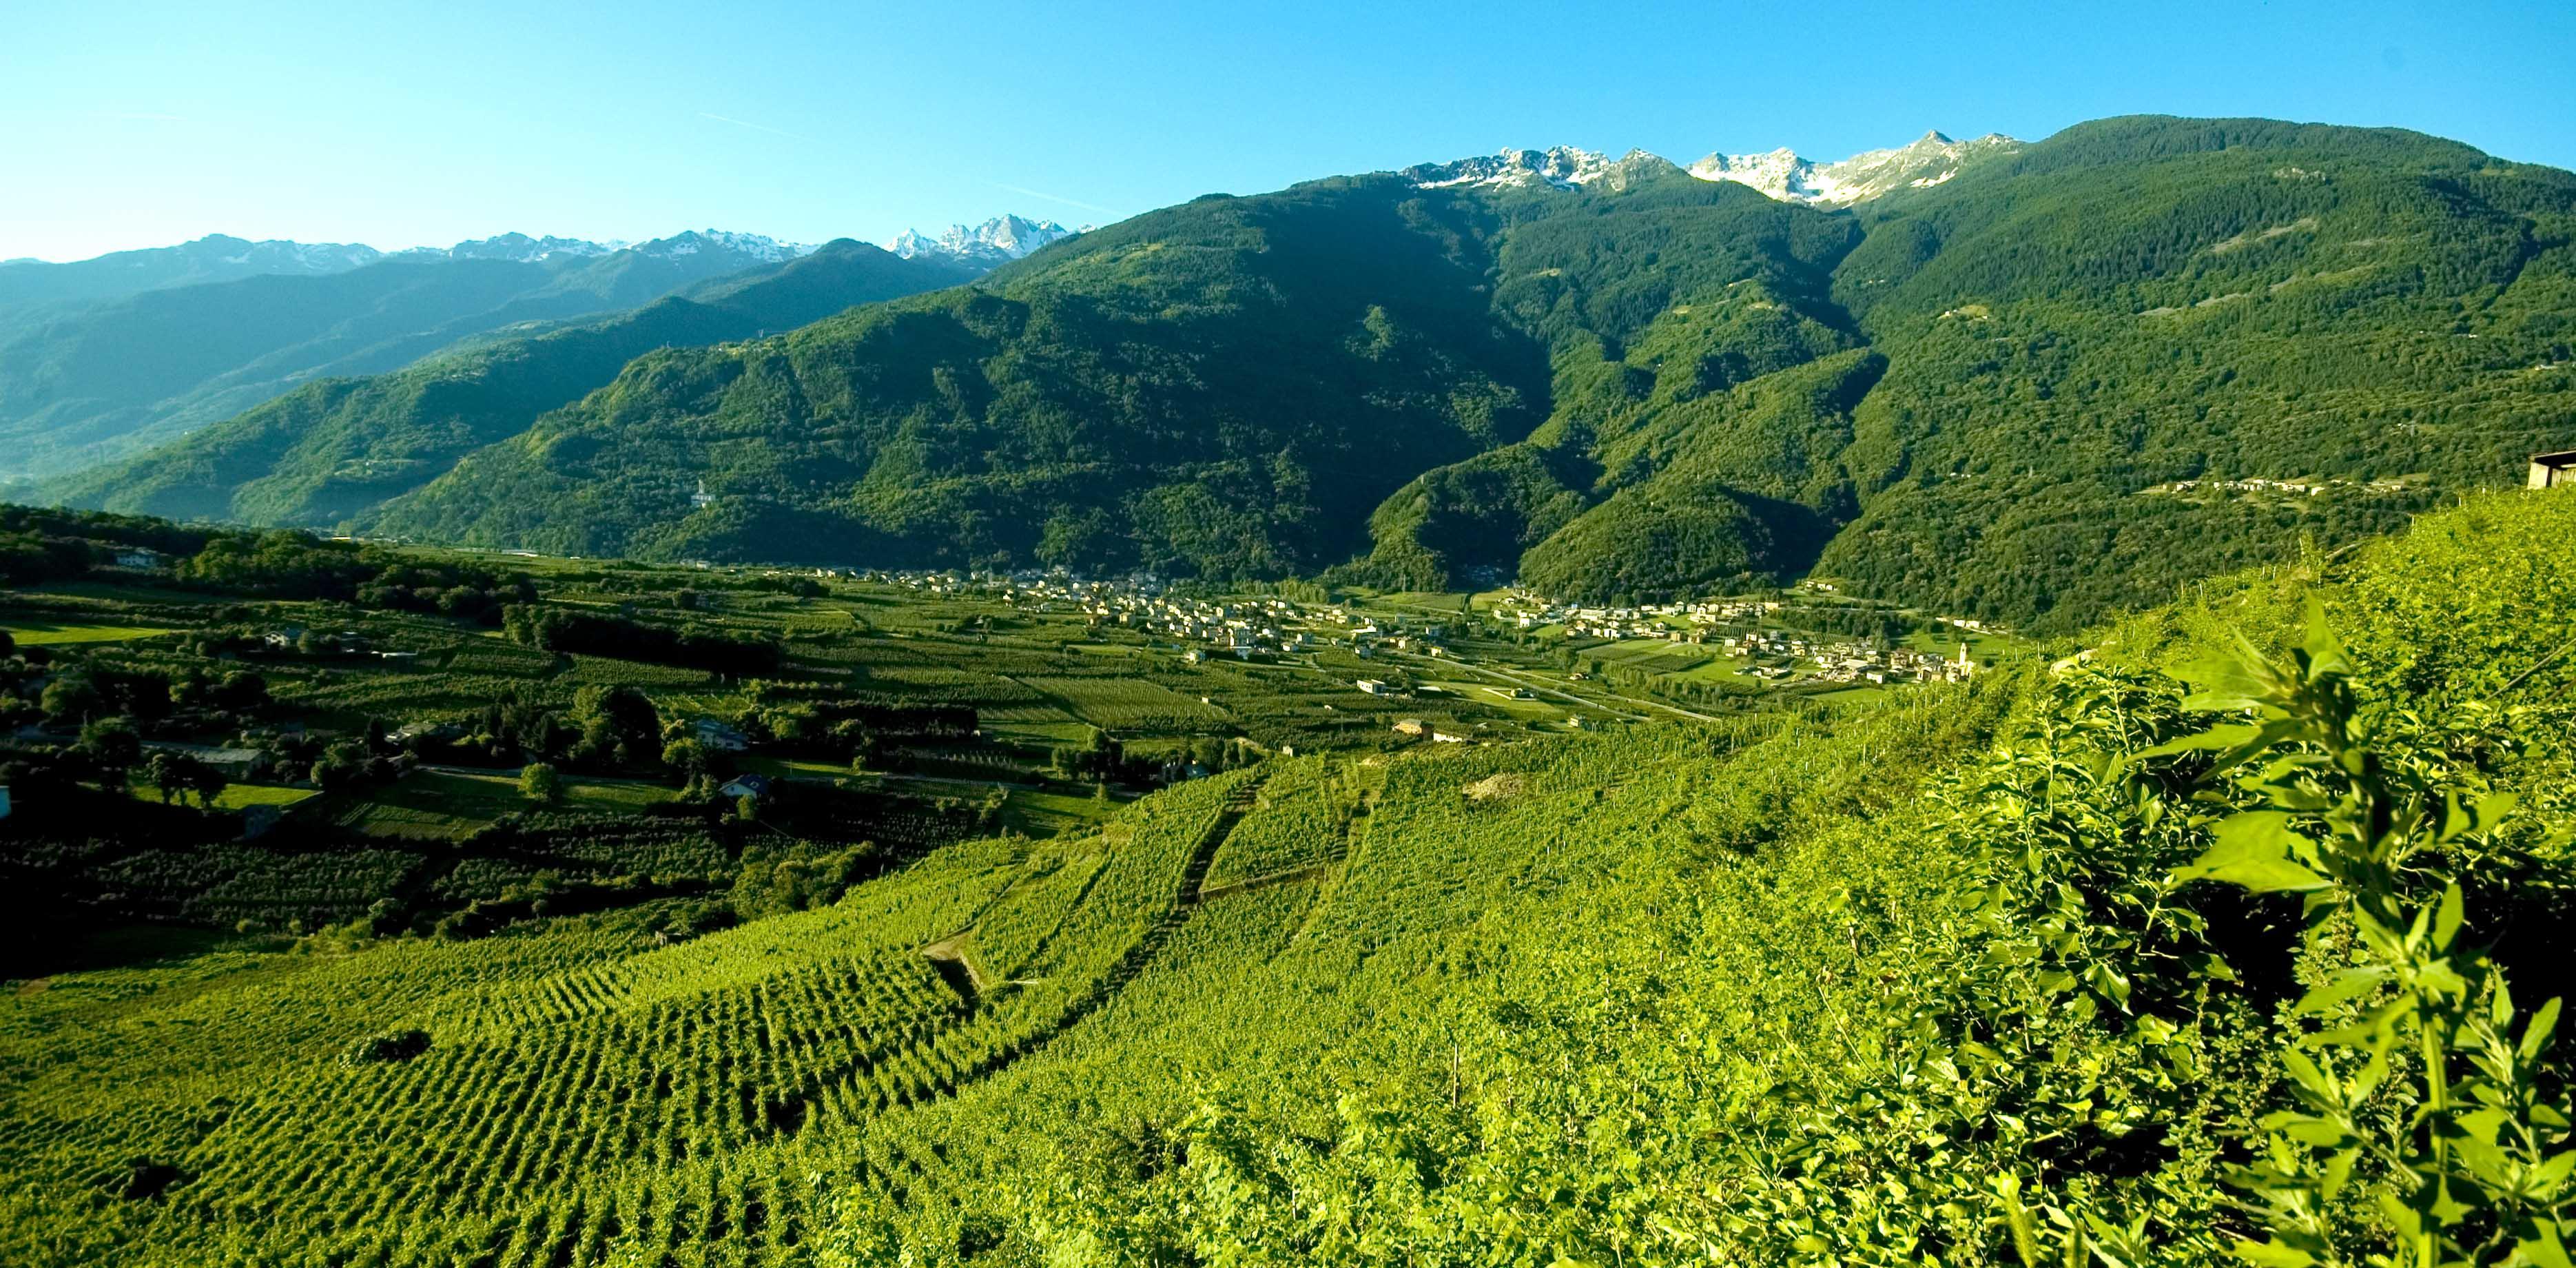 Scoprire la Valtellina passeggiando tra i vigneti